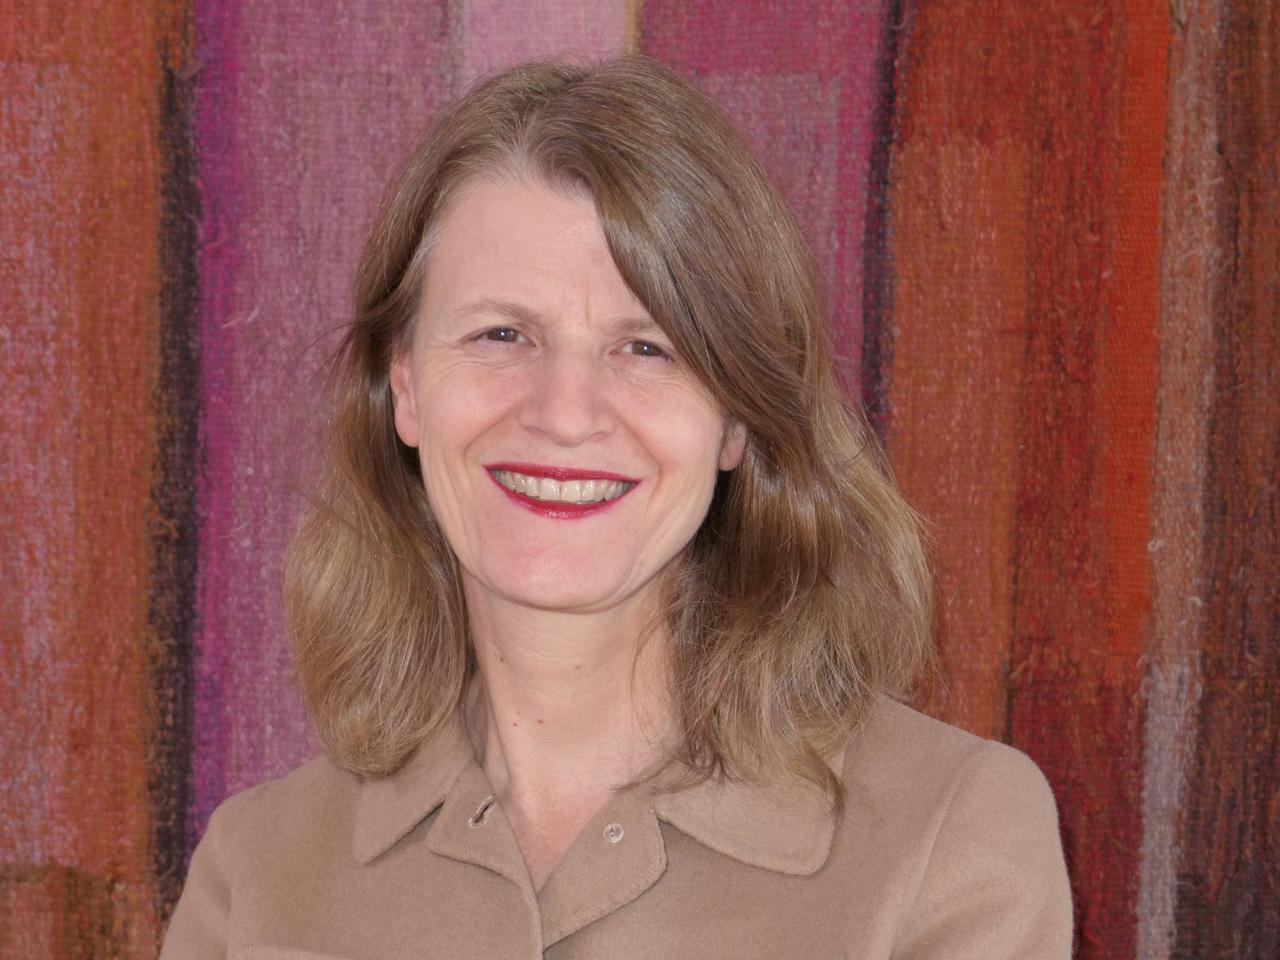 Barbara Plankensteiner, neue Direktorin des Museums für Völkerkunde in Hamburg Foto: privat / Kulturbehörde Hamburg